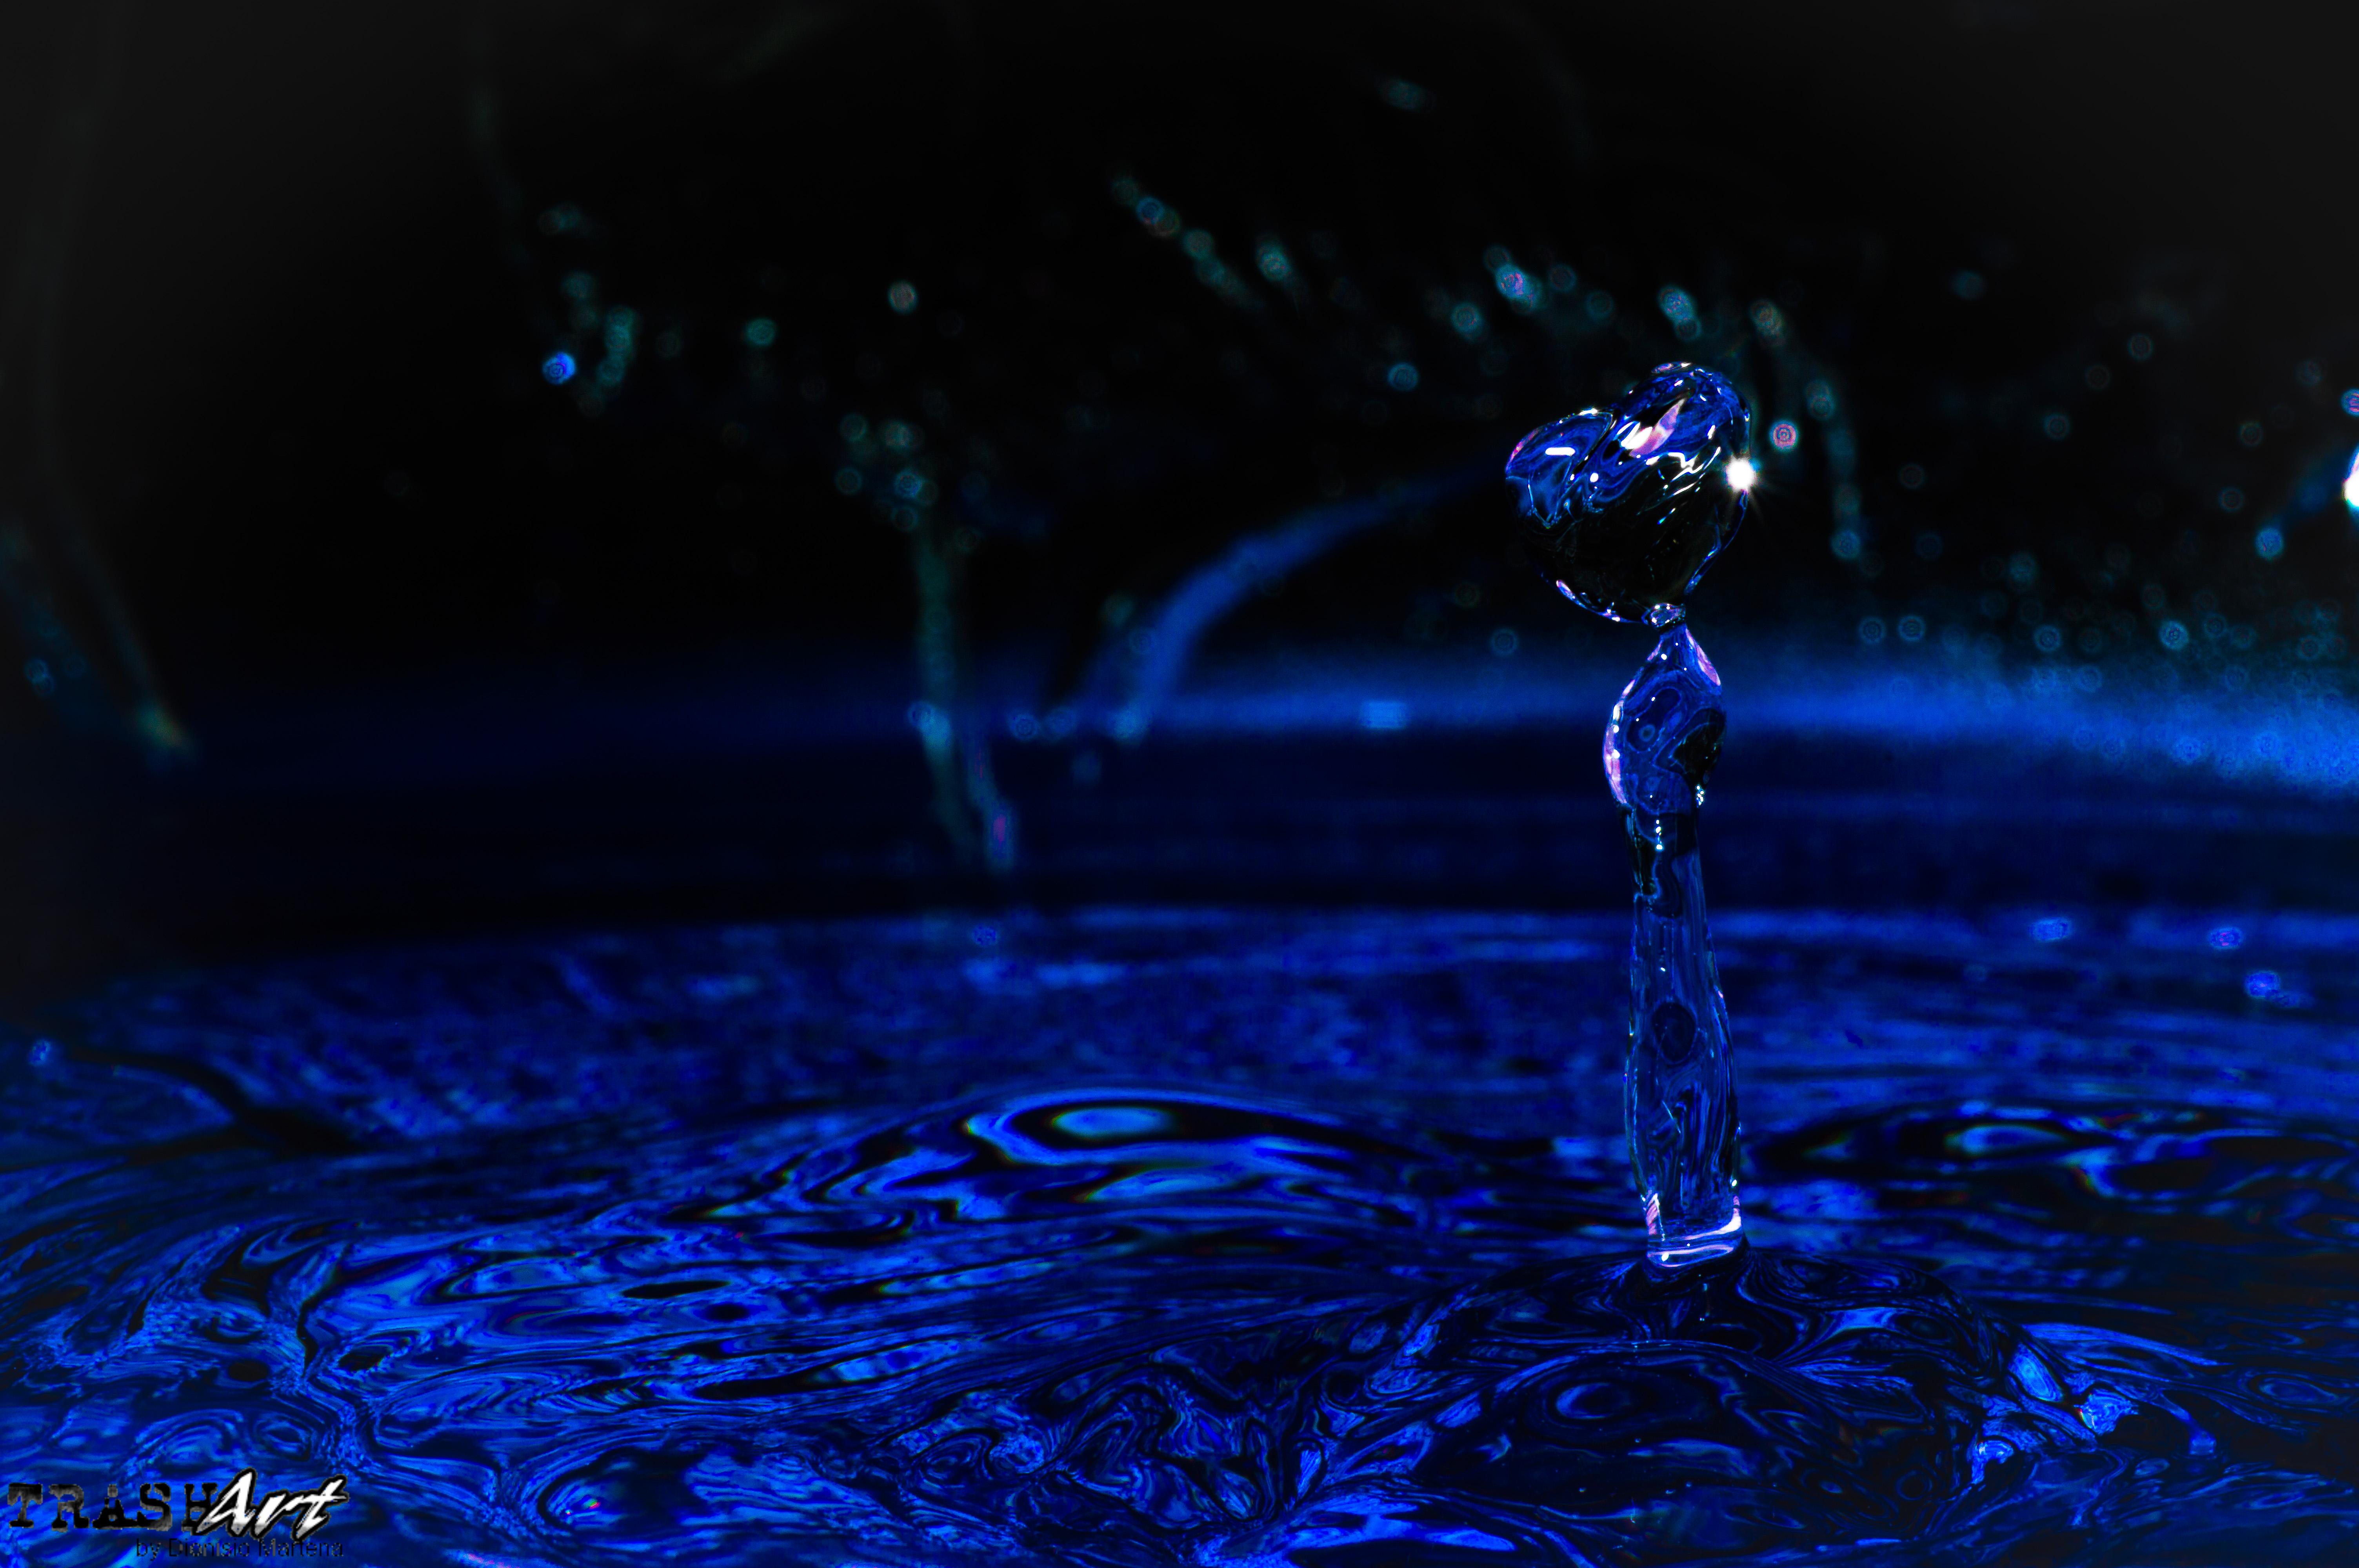 WaterByDioTenaTrashArt